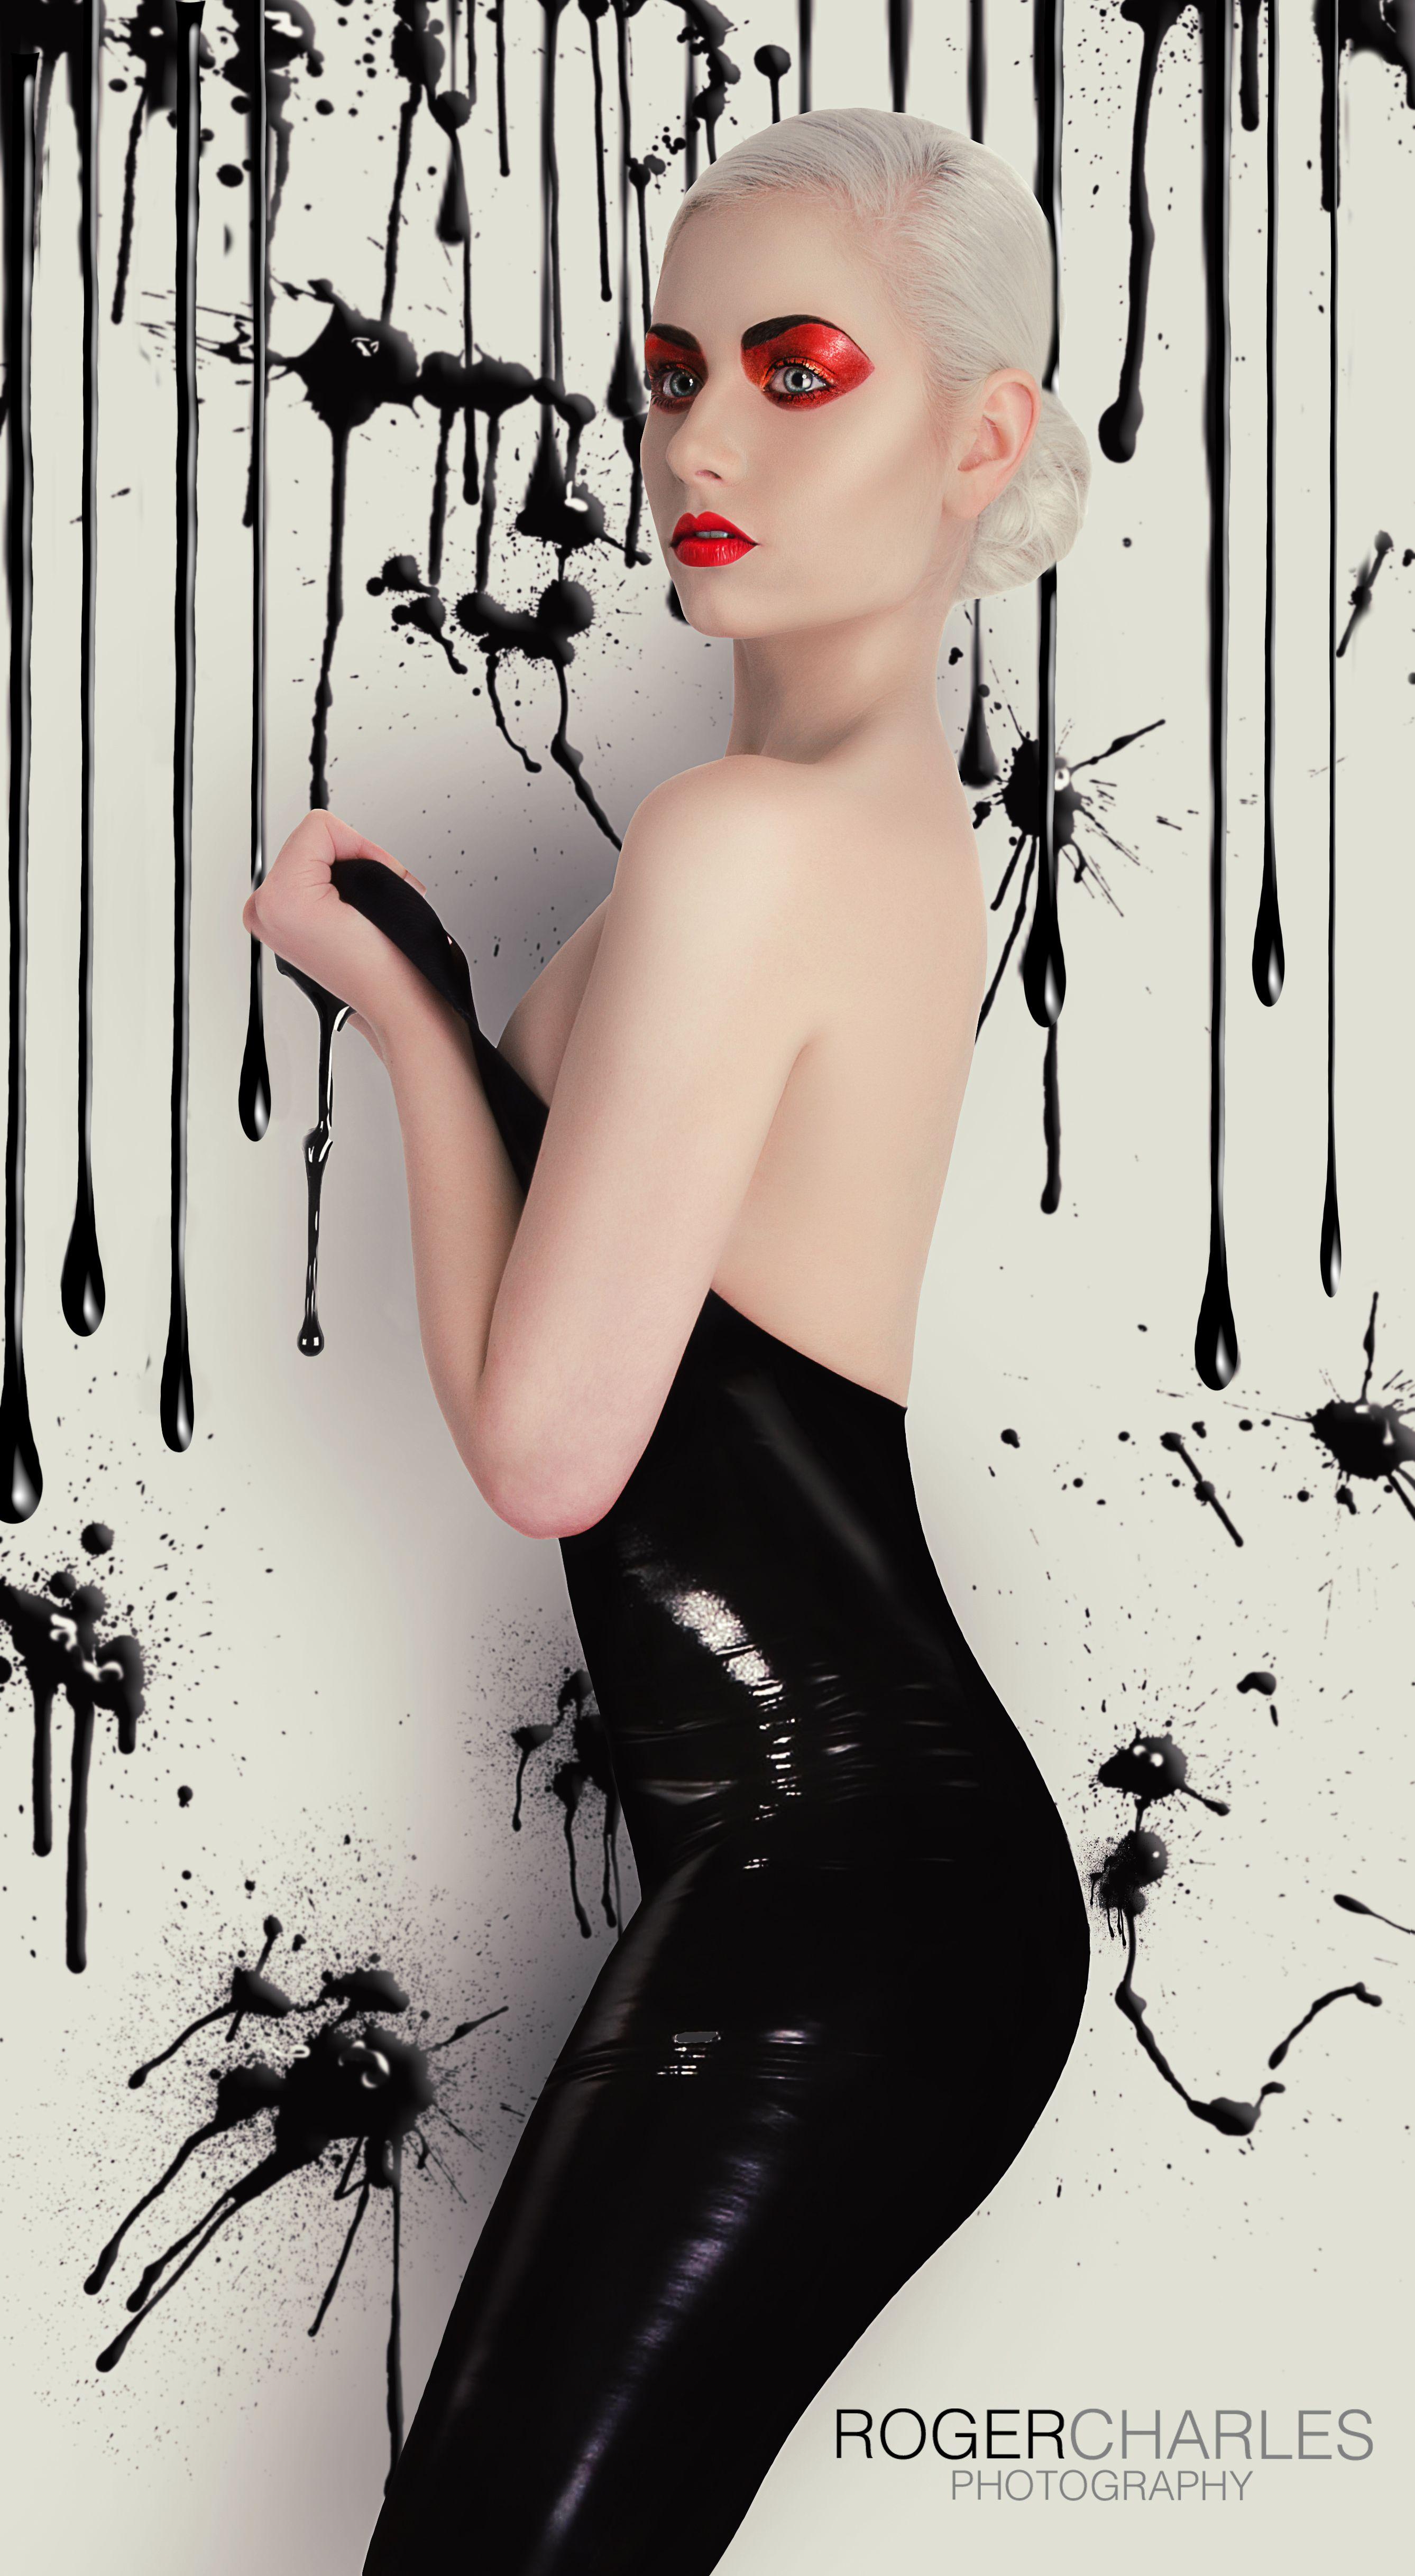 Sofia vergara naked pictures